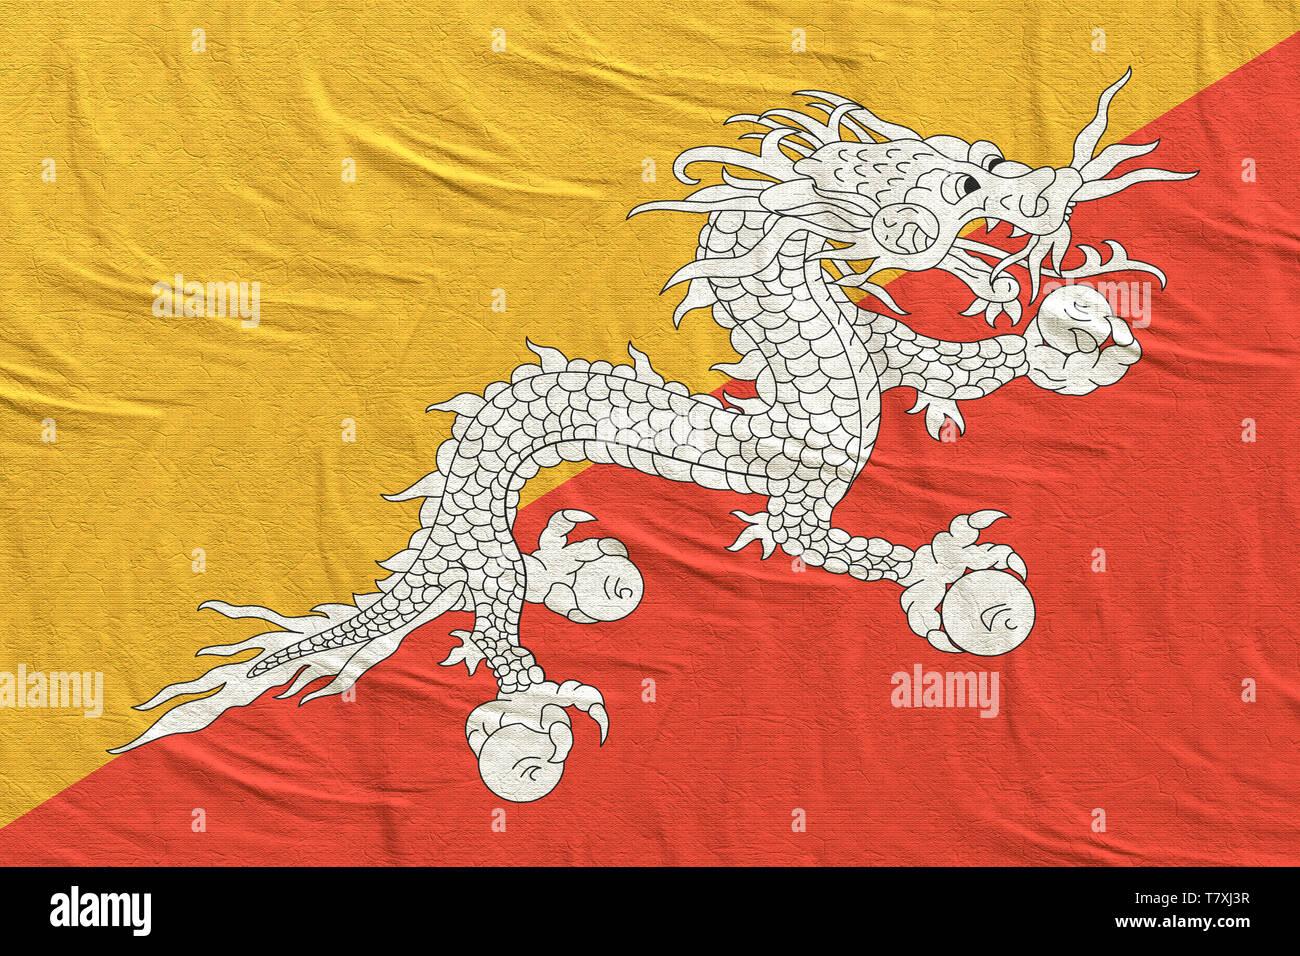 3d rendering of a Bhutan flag silk - Stock Image